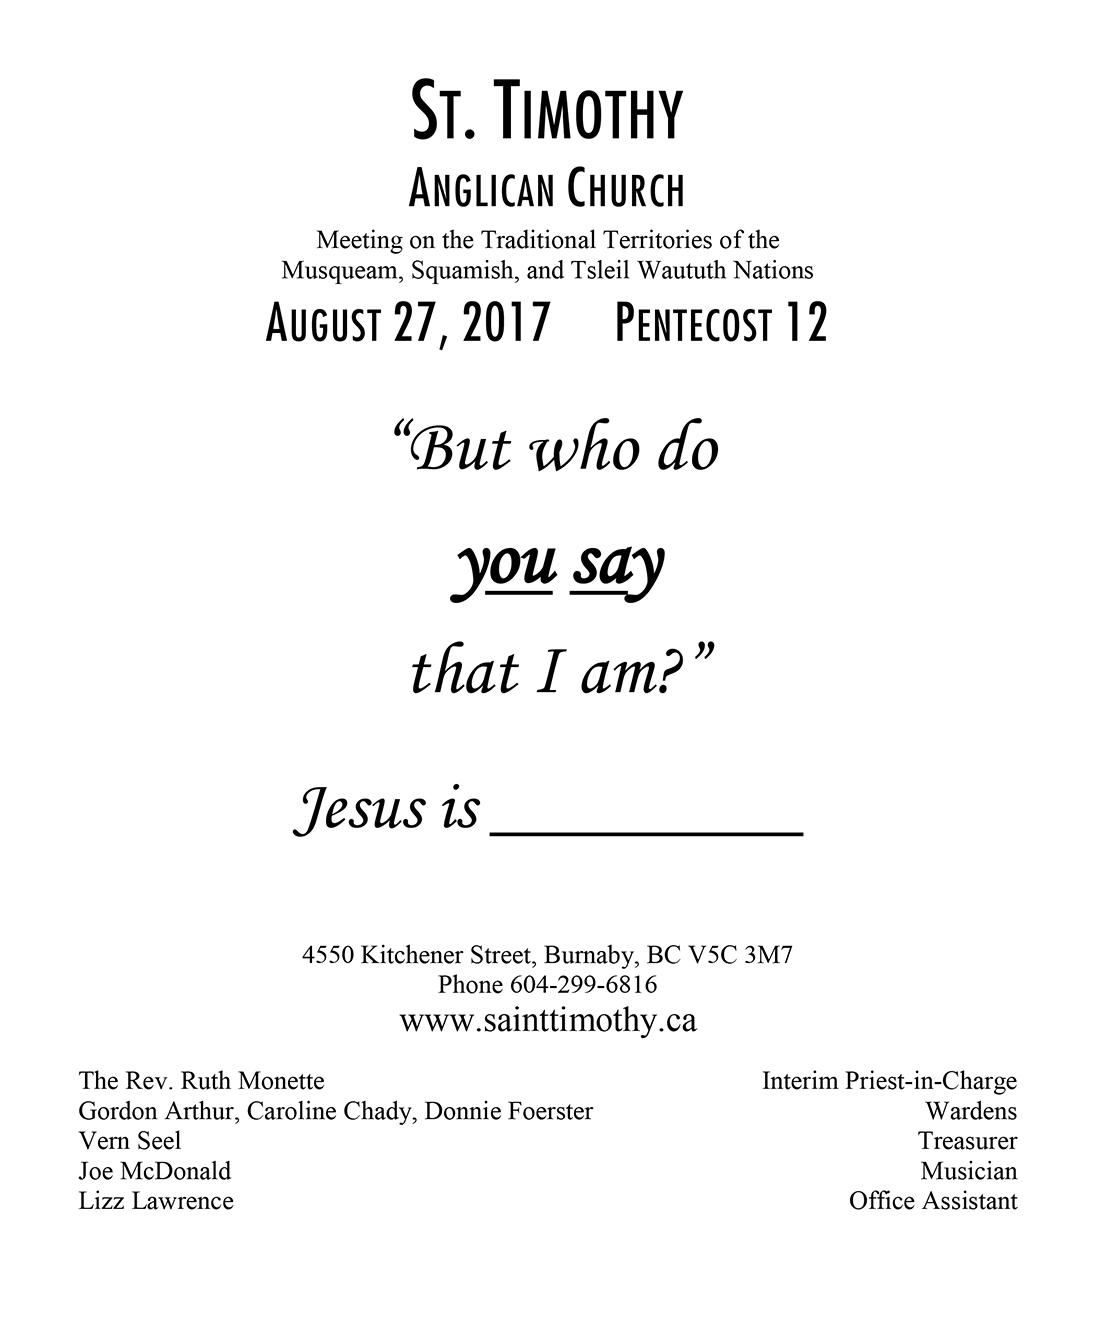 Bulletin: August 27, 2017